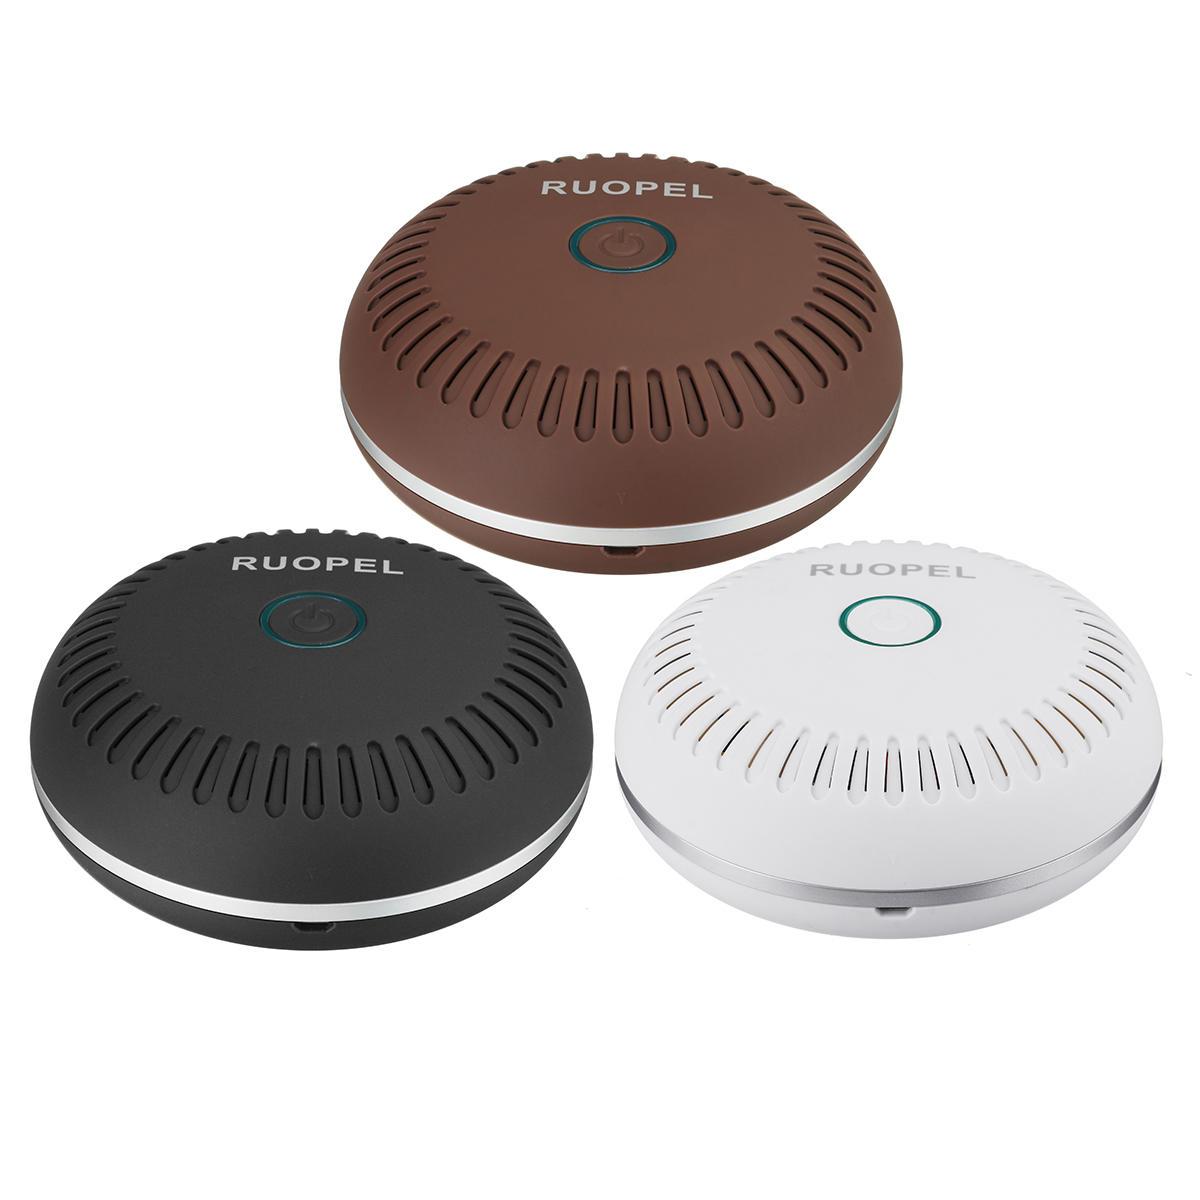 Car-Air-Purifier-with-HEPA-Filter-Mini-Travel-USB-Air-Cleaner-Freshener-Pretty фото